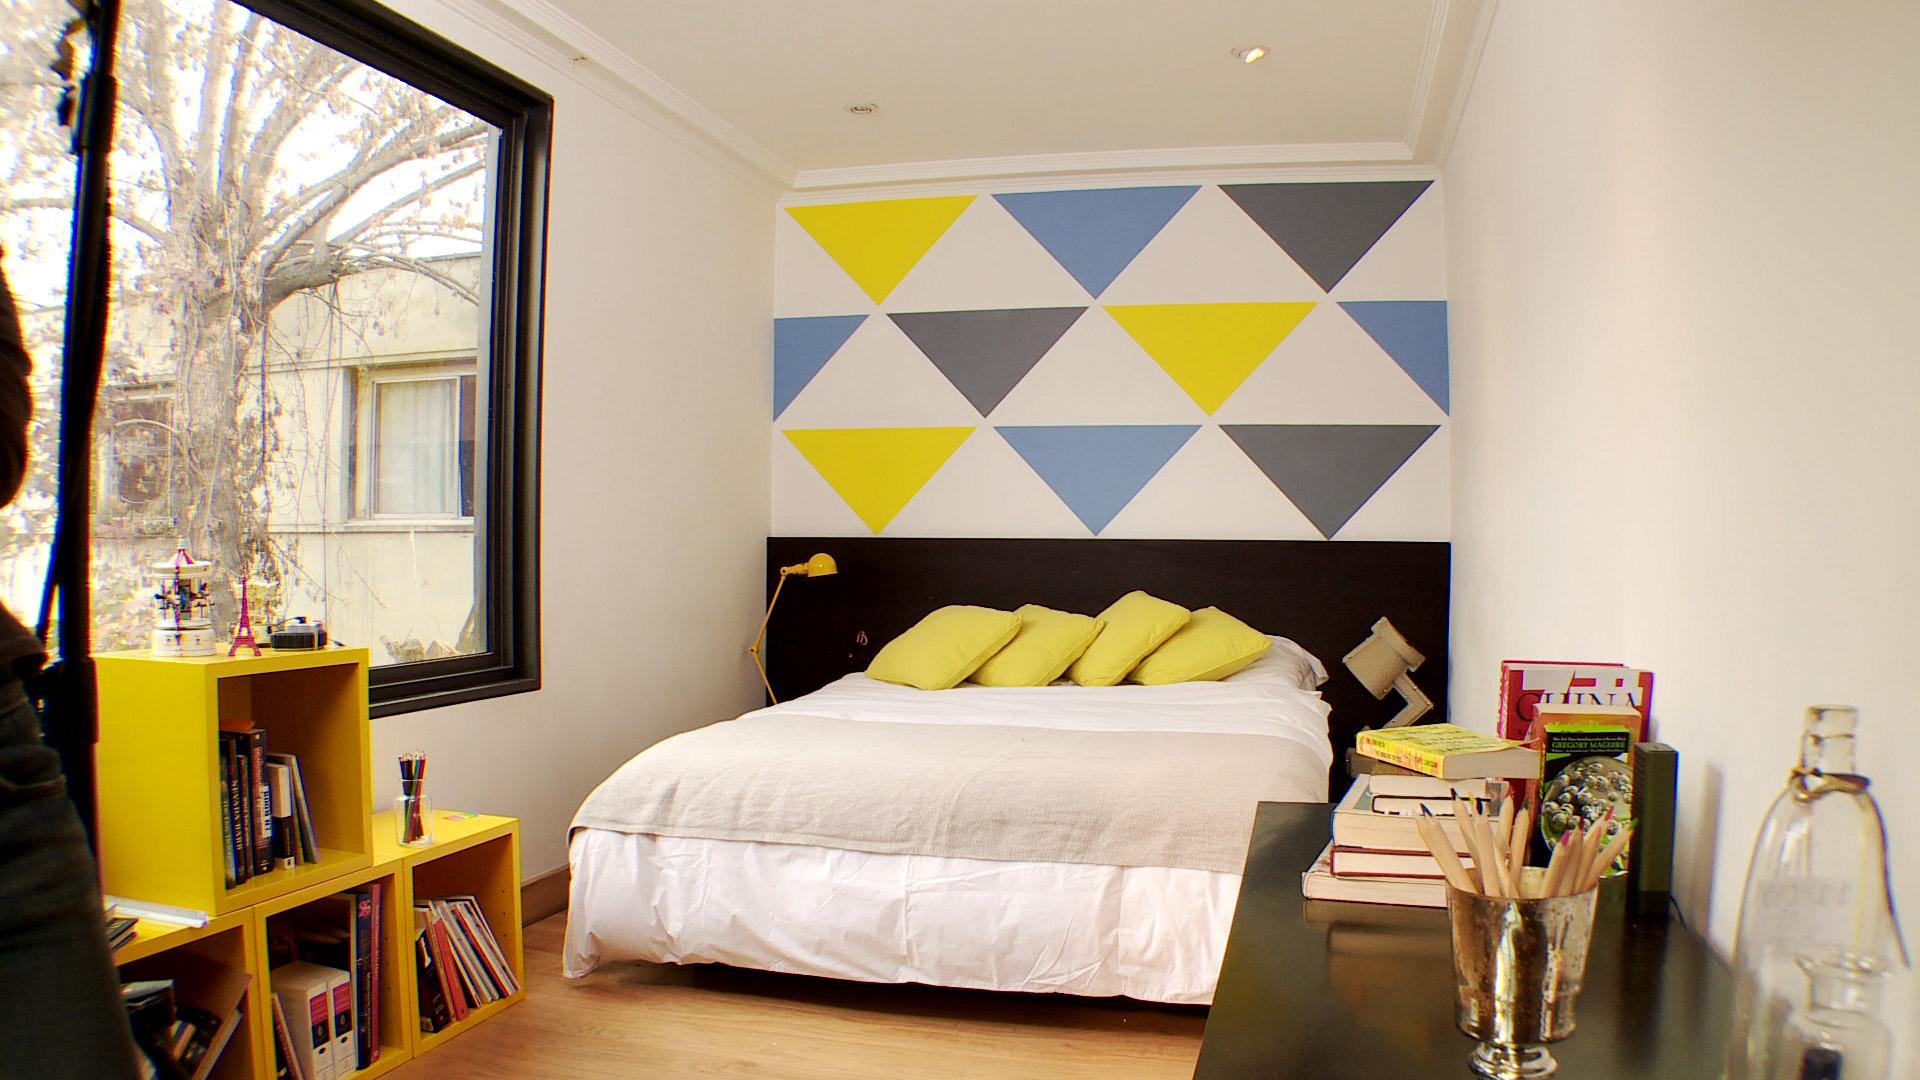 H galo Usted Mismo C mo pintar un muro con figuras geom tricas